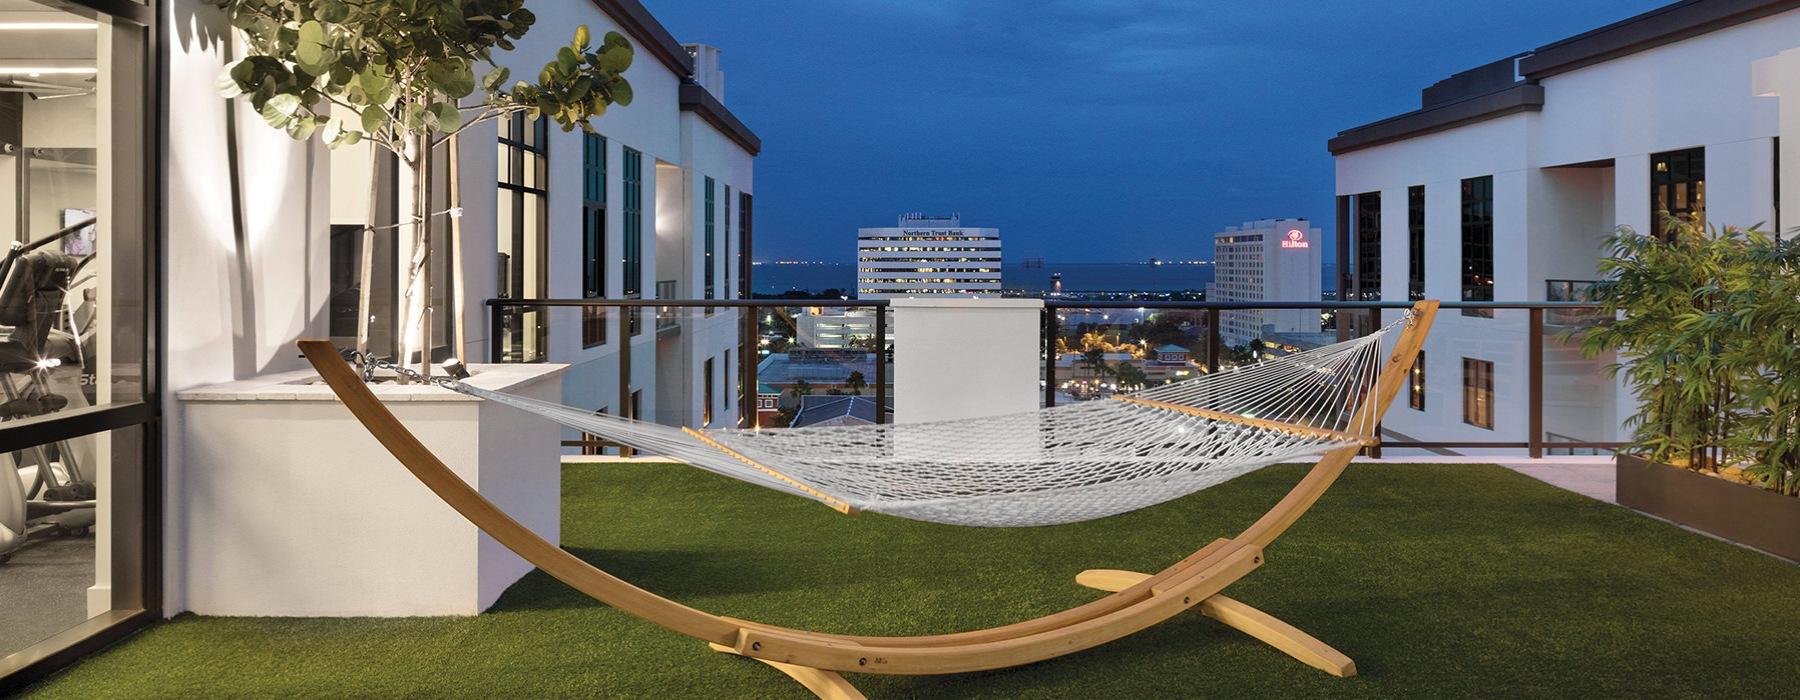 rooftop hammock